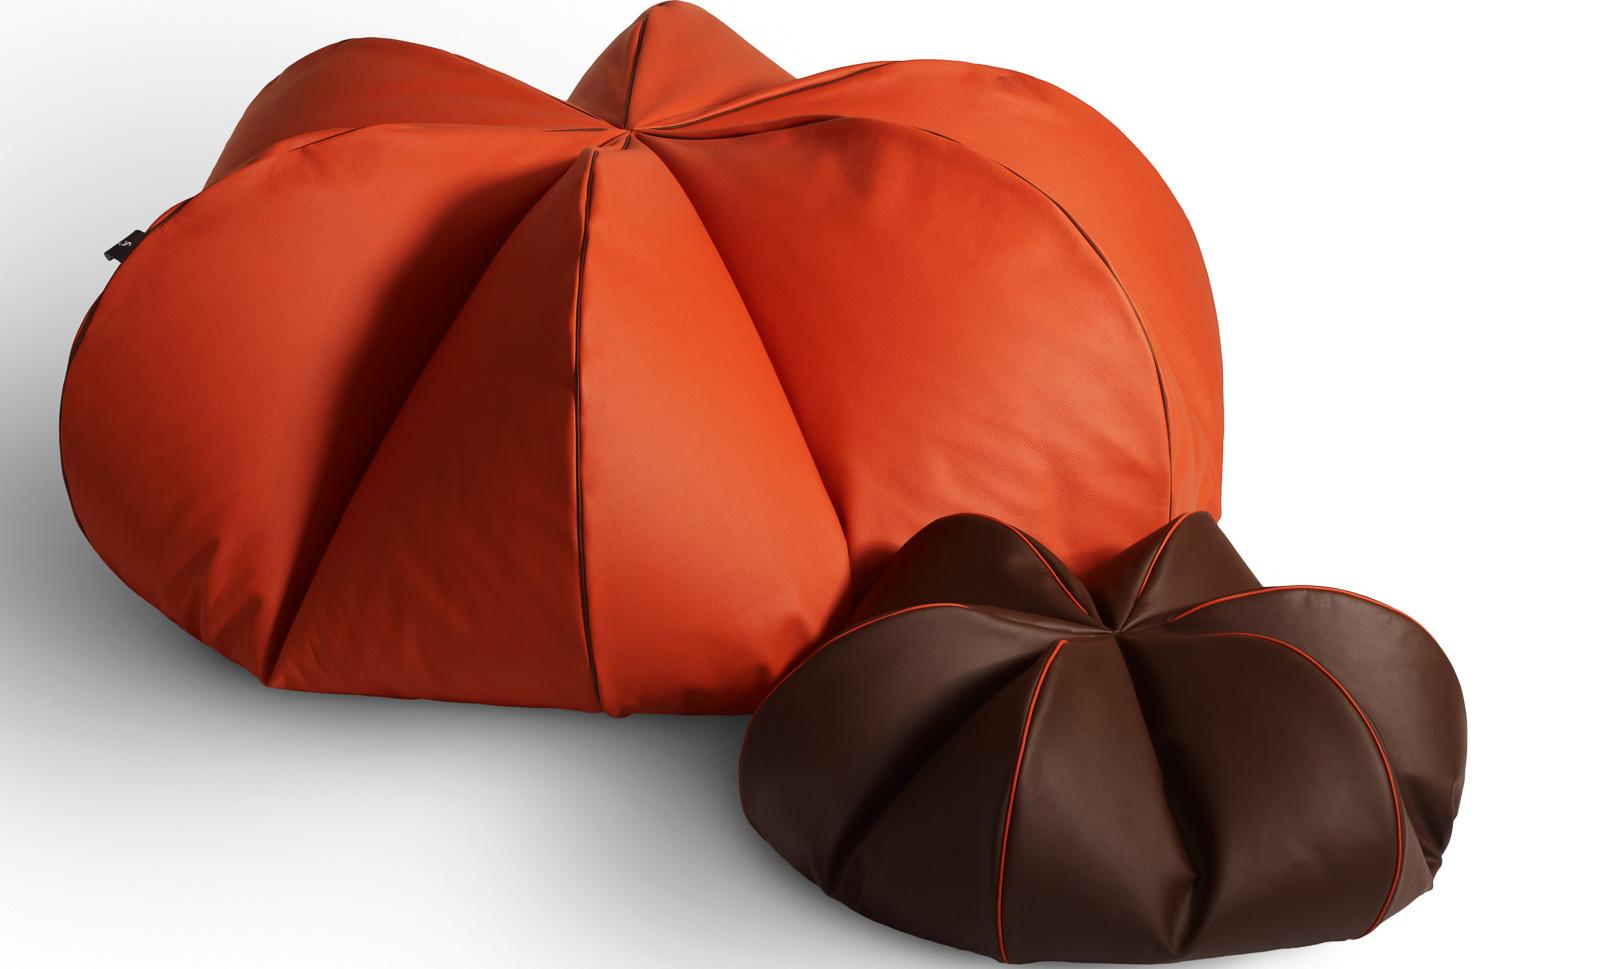 Leather Beanbags Oranger & Chocolat